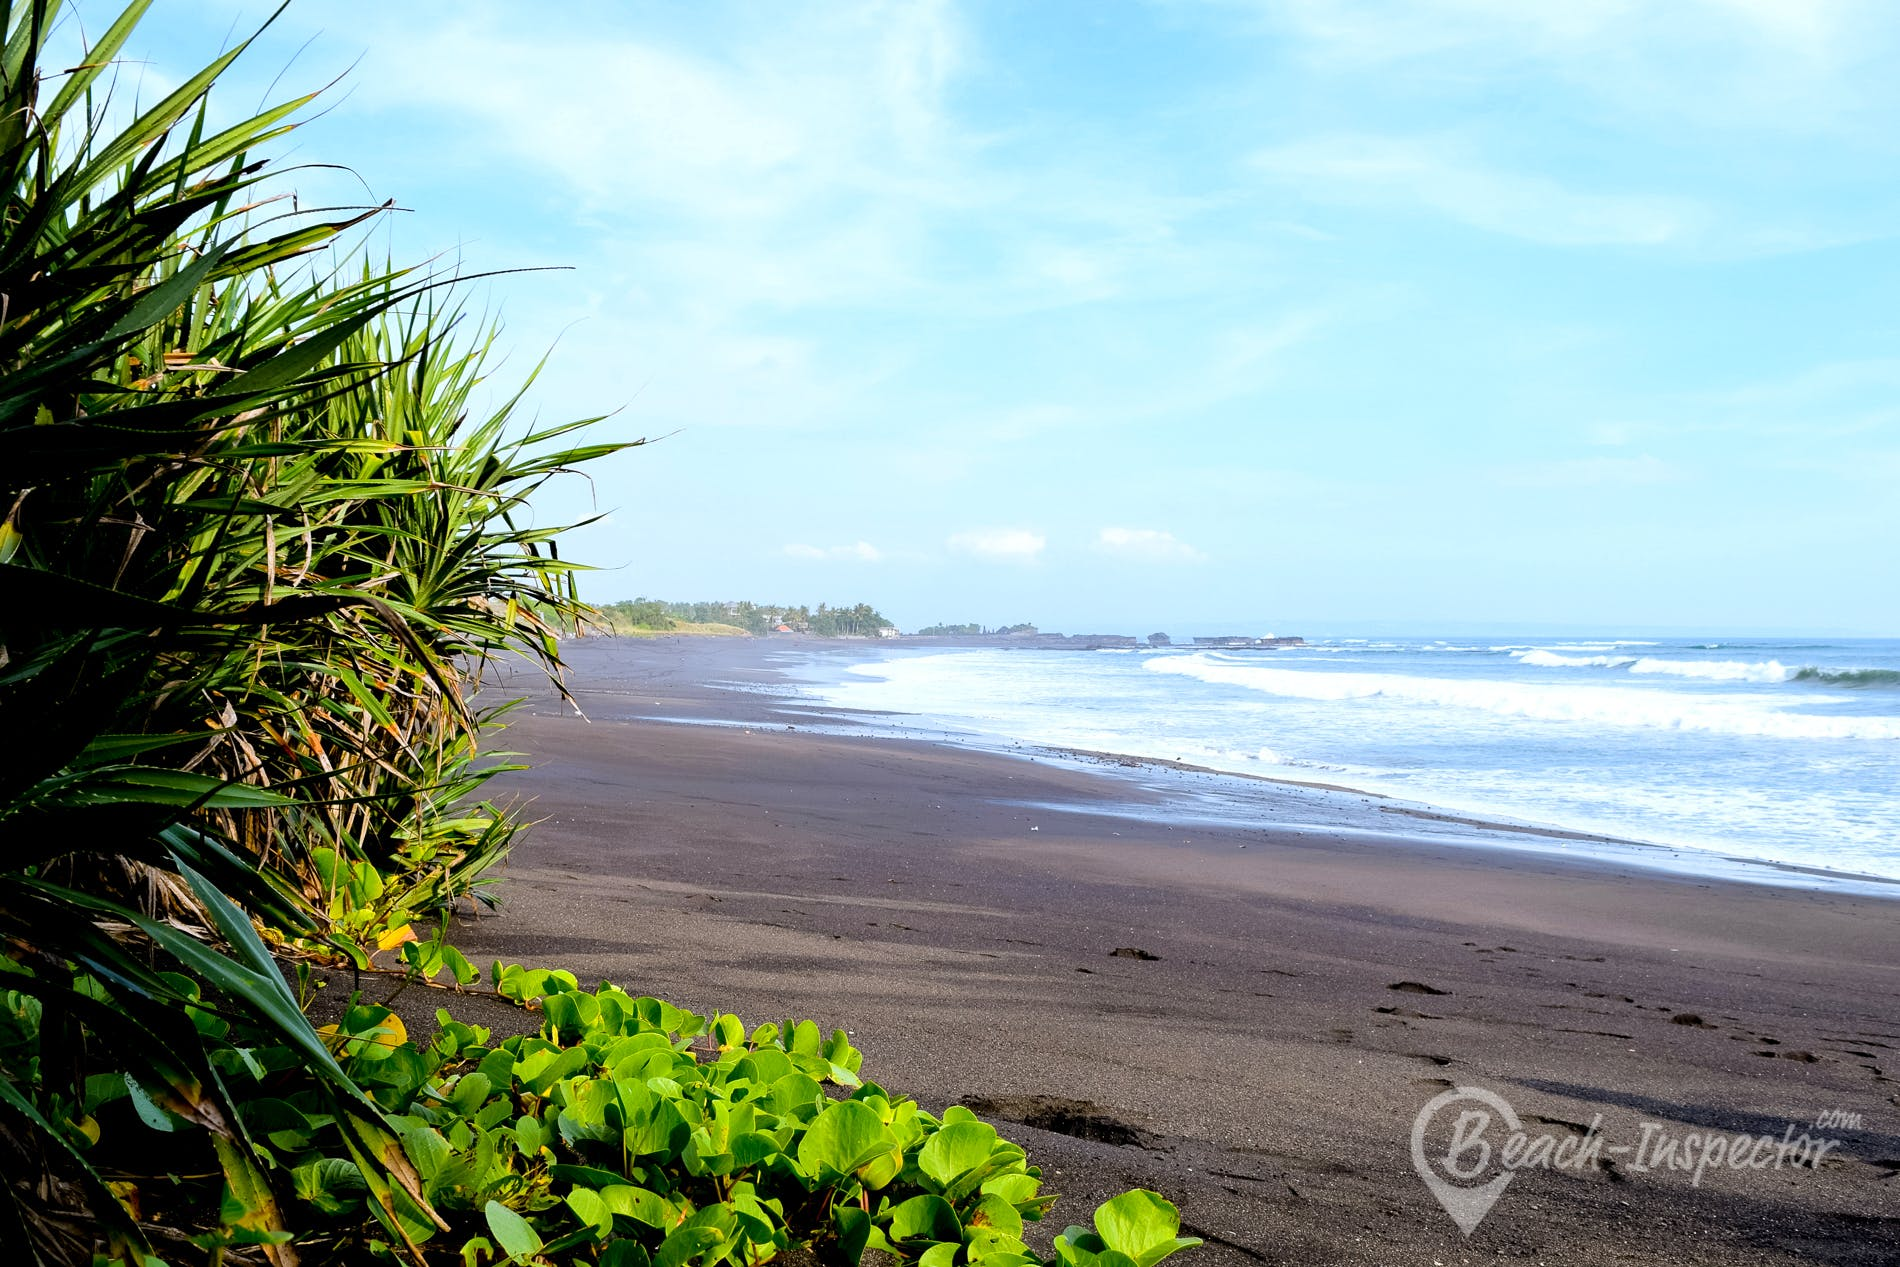 Beach Nyanyi Beach, Bali, Indonesia